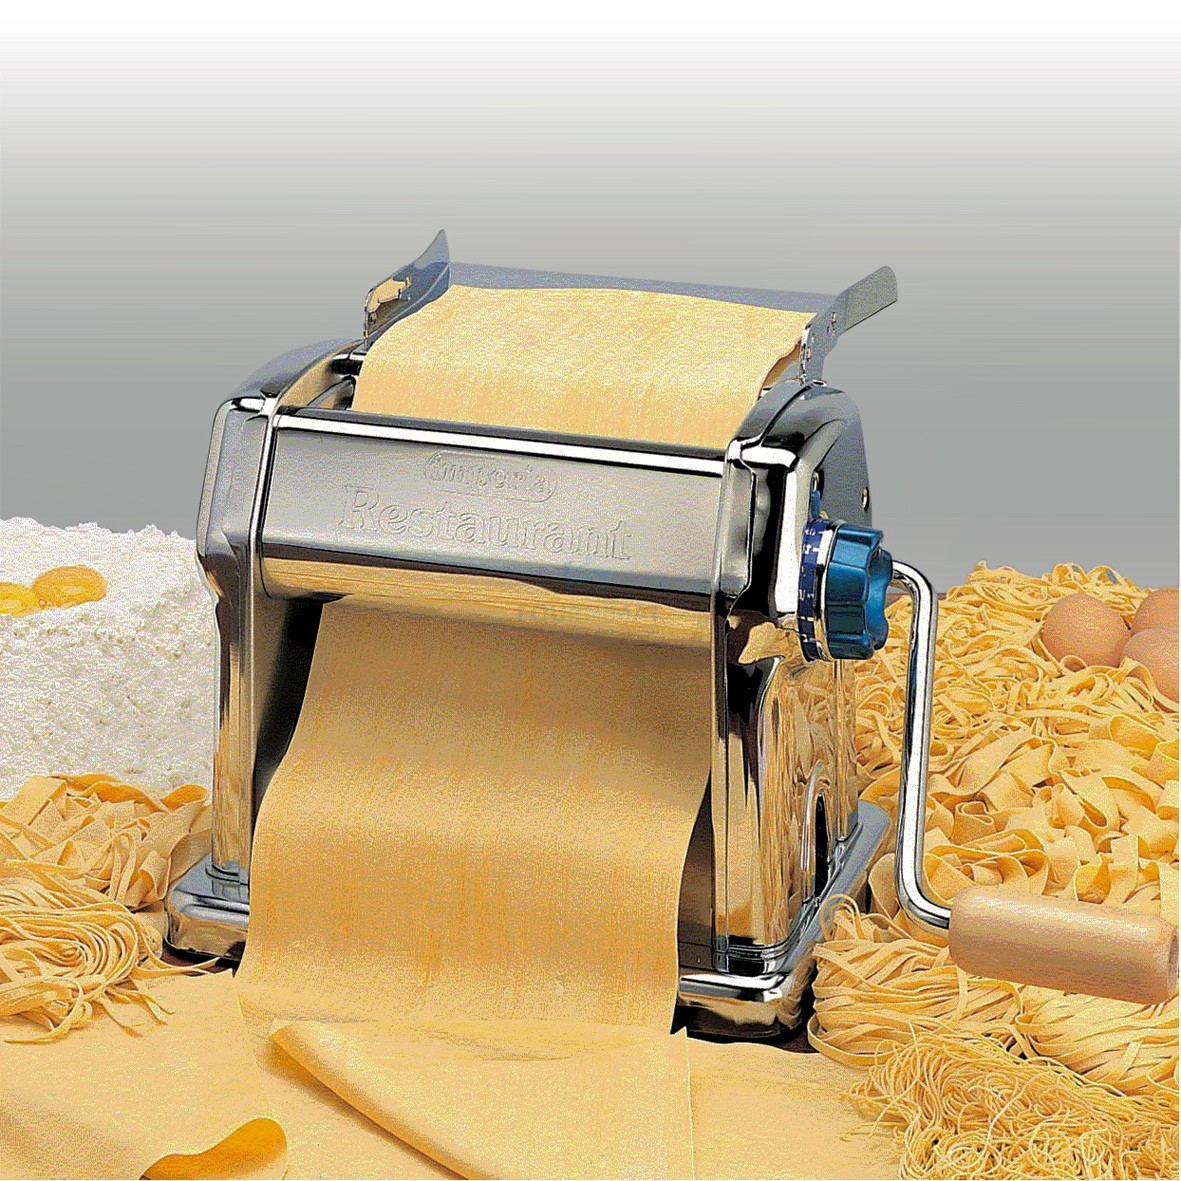 Машинка для раскатки теста в домашних условиях эльдорадо